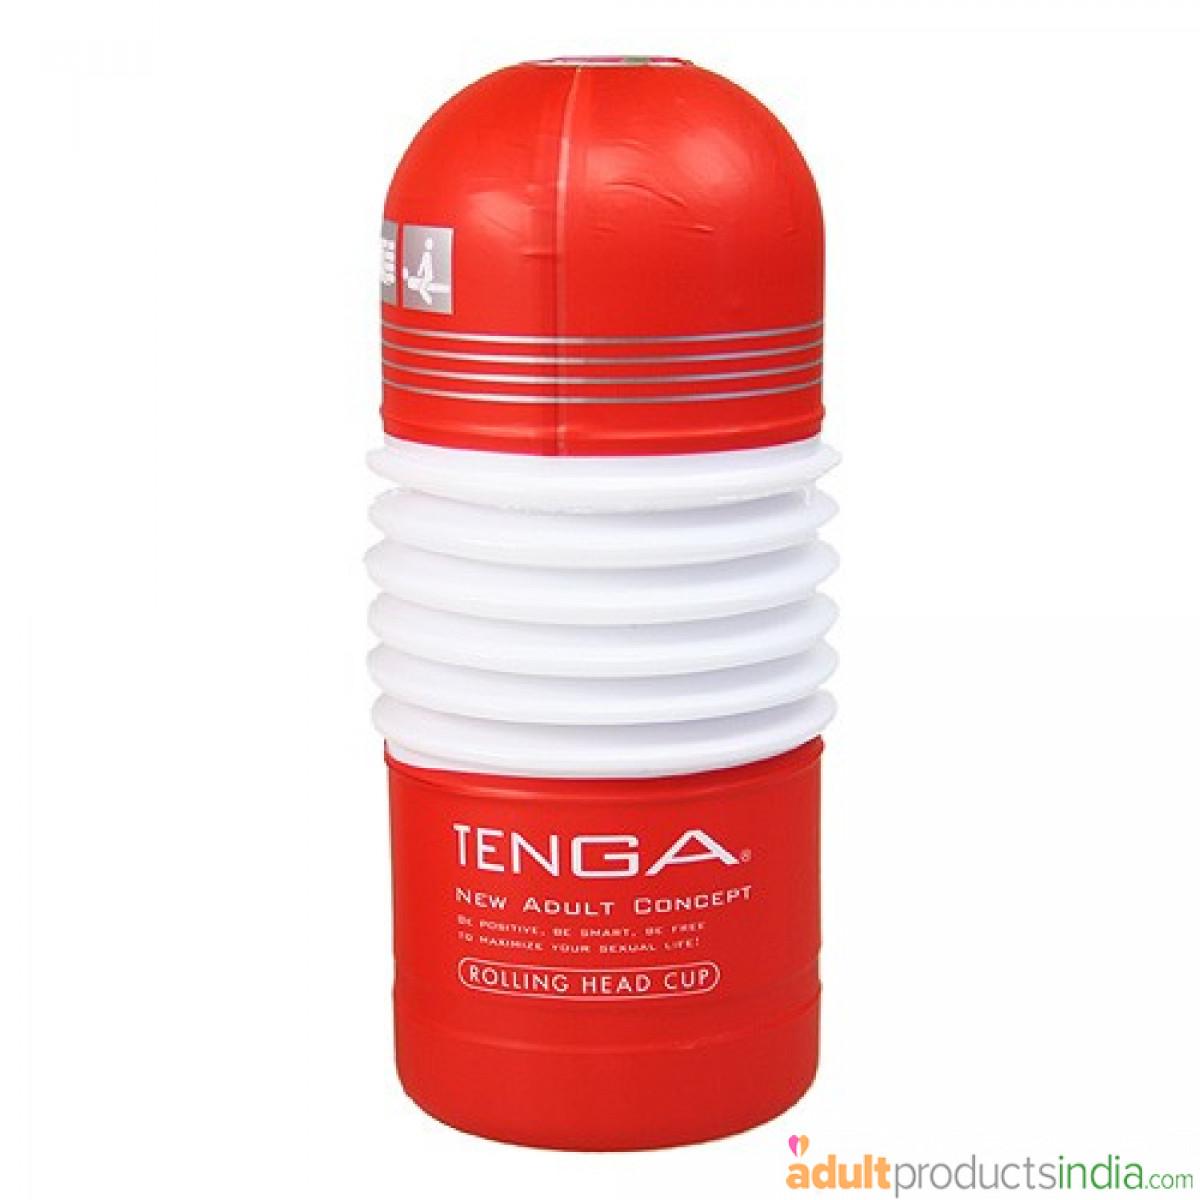 Tenga Rolling Head Cup - 103